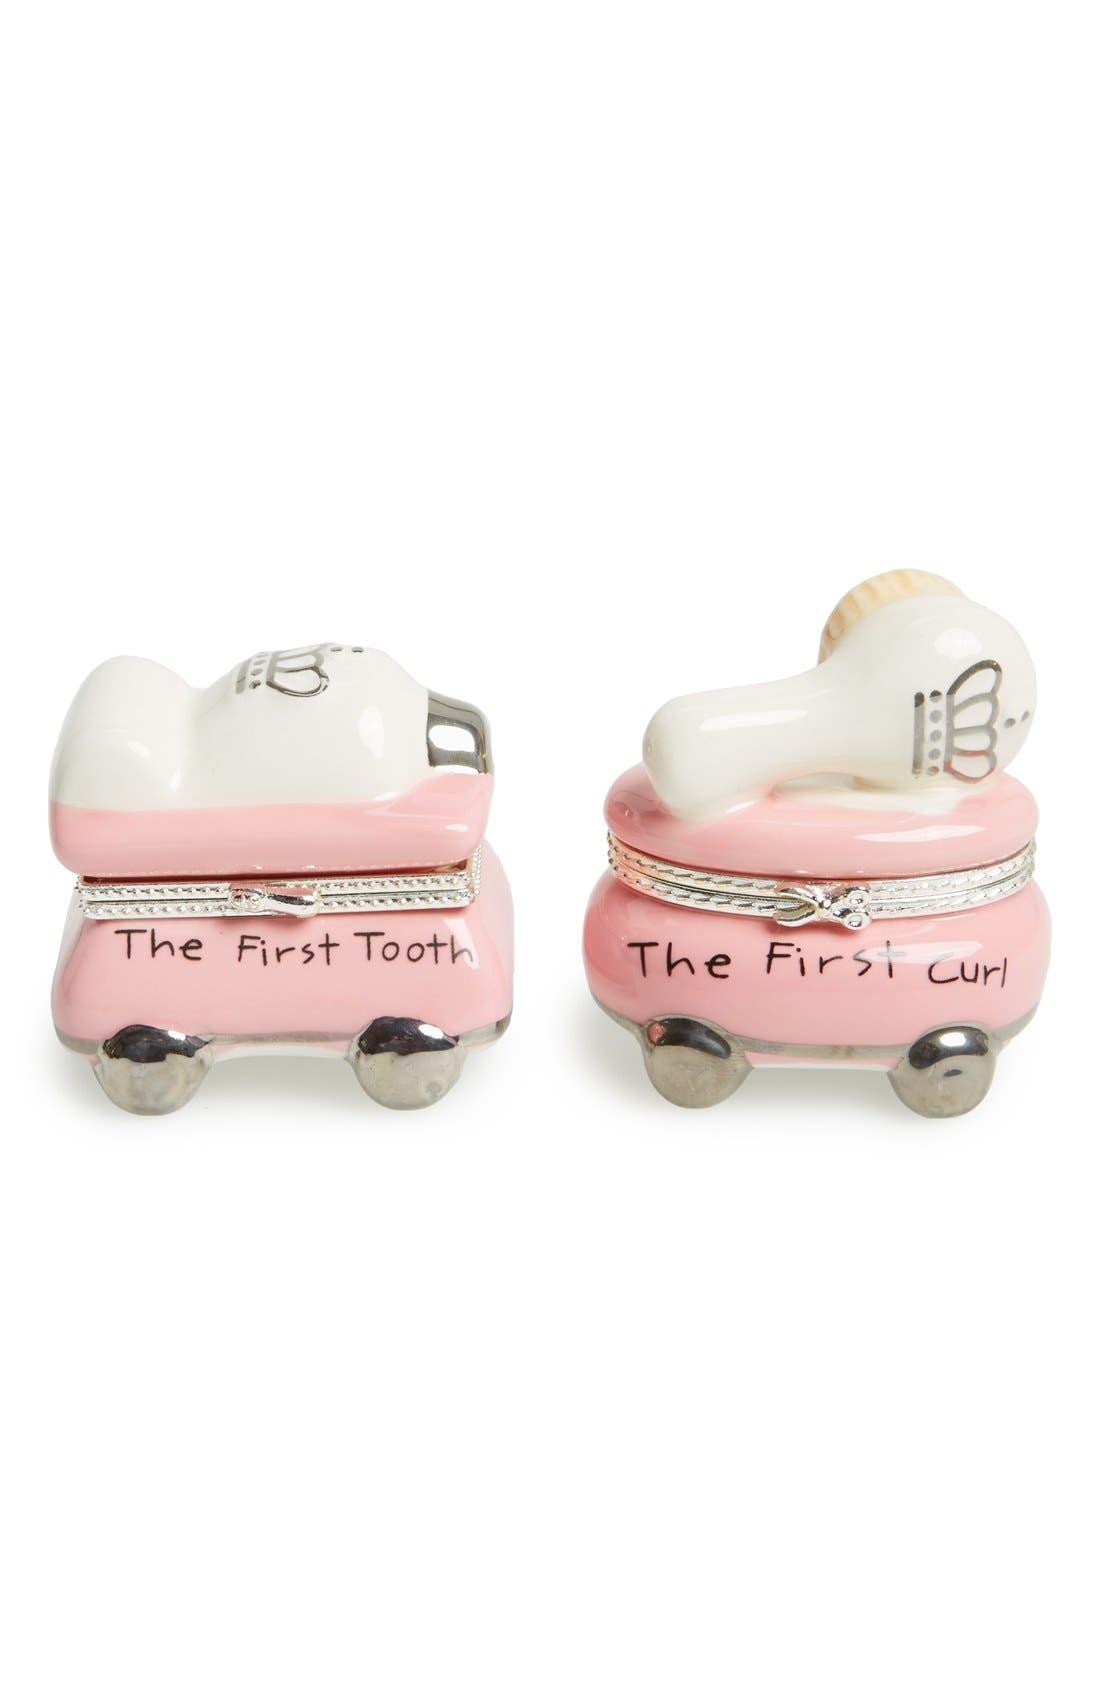 MUD PIE 'Princess' First Tooth & Curl Treasure